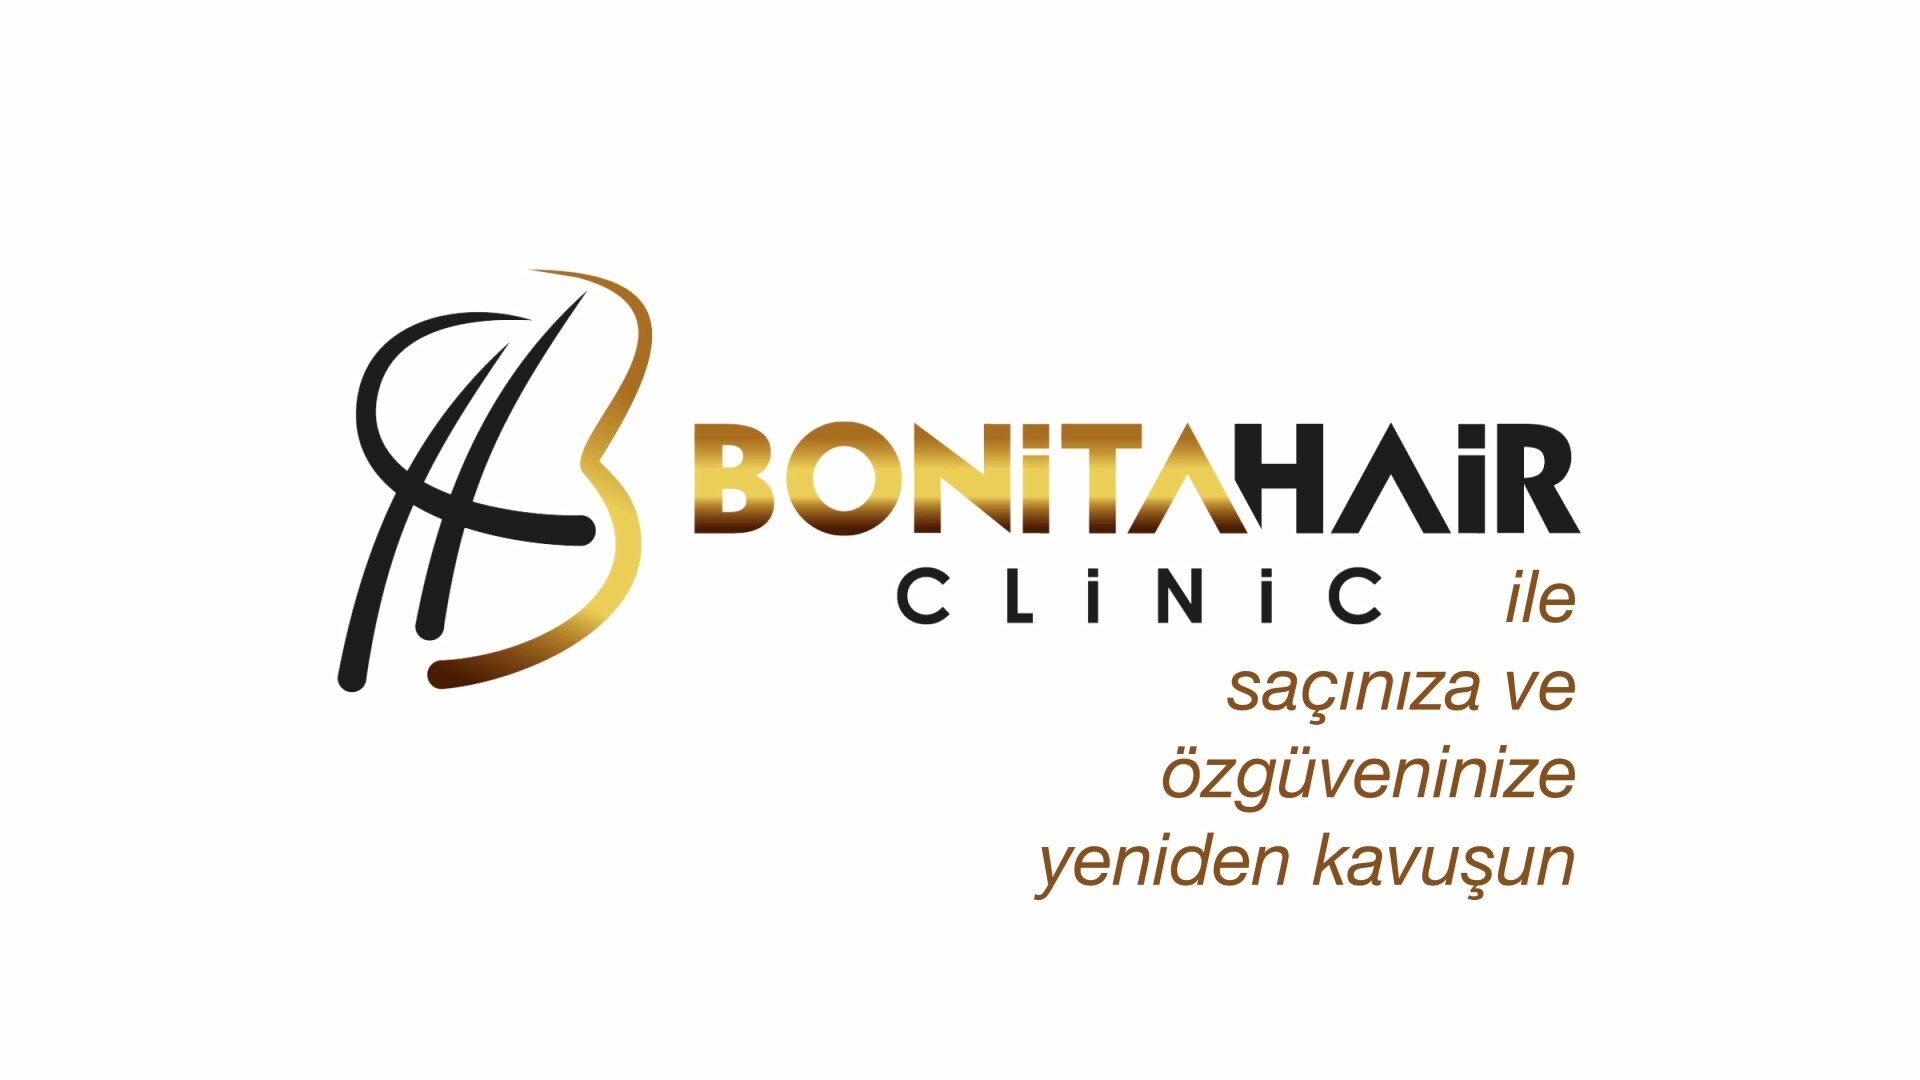 BonitaHairClinicPaylaşım.mp4 snapshot 00.58.692 1920x1080 - BONITA HAIR CLINIC ANİMASYON FİLMİ